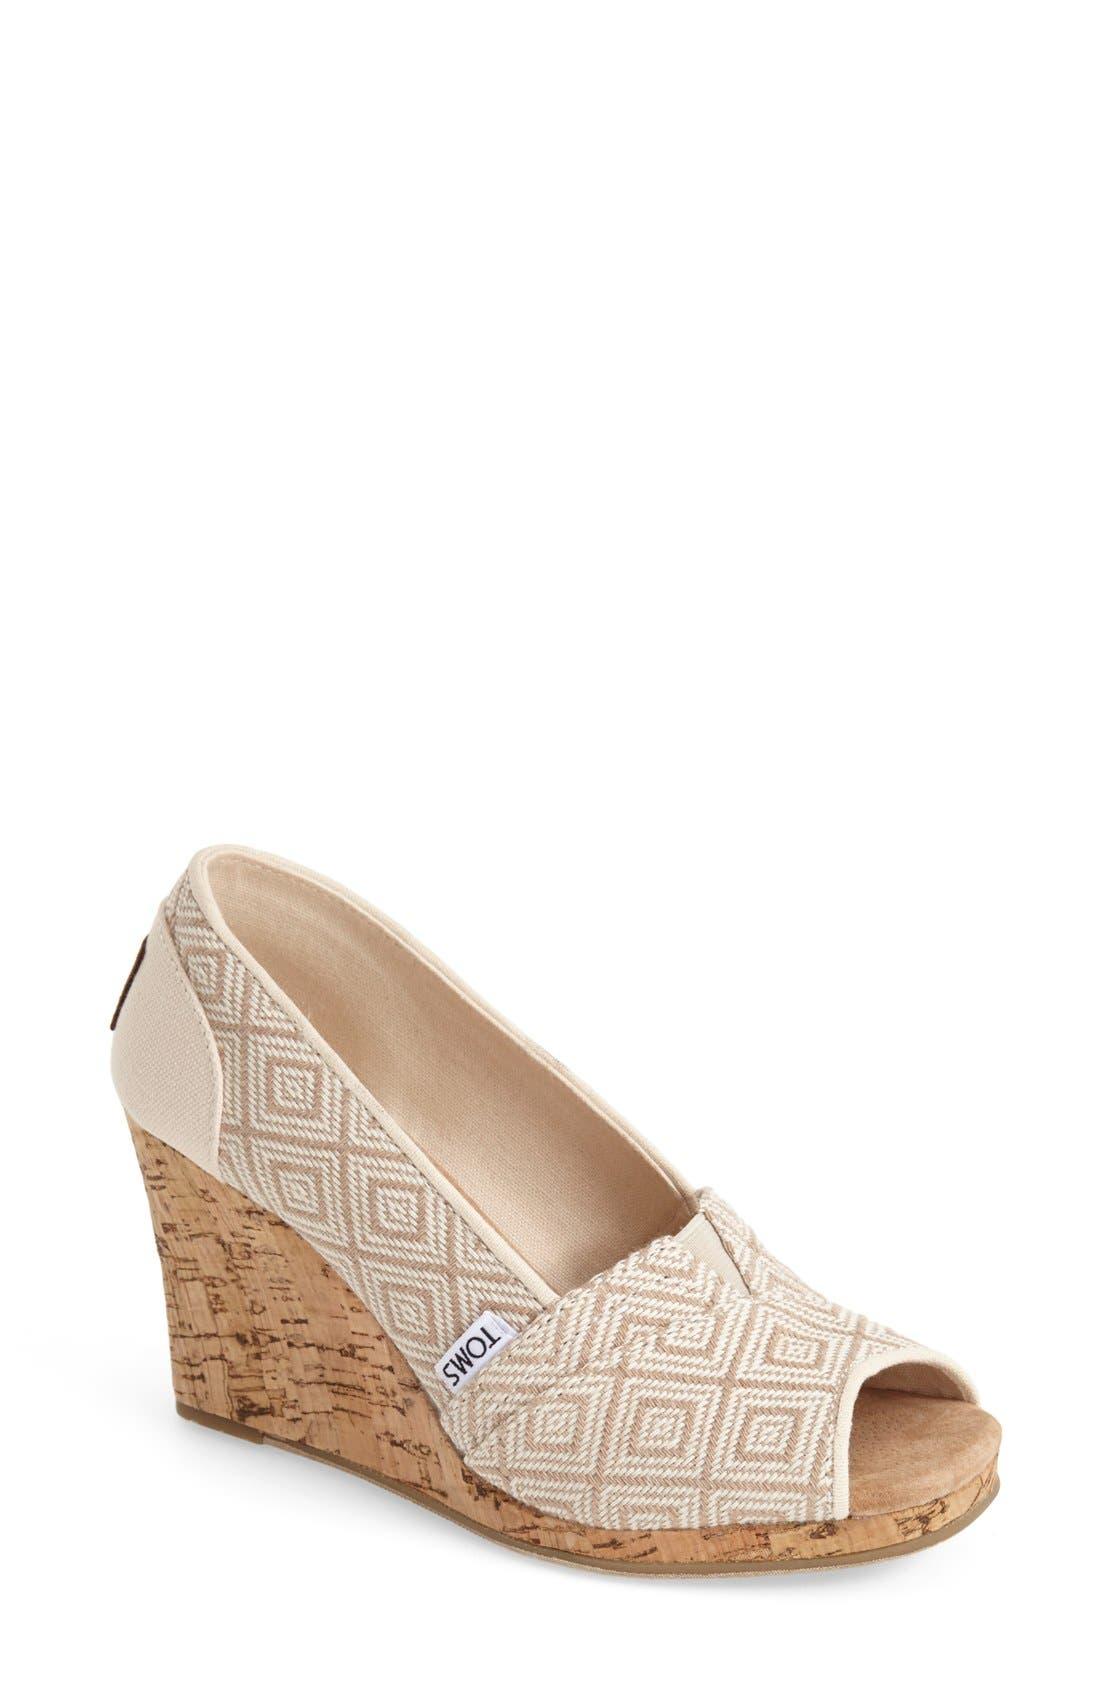 Main Image - TOMS 'Classic' Woven Wedge Sandal (Women)